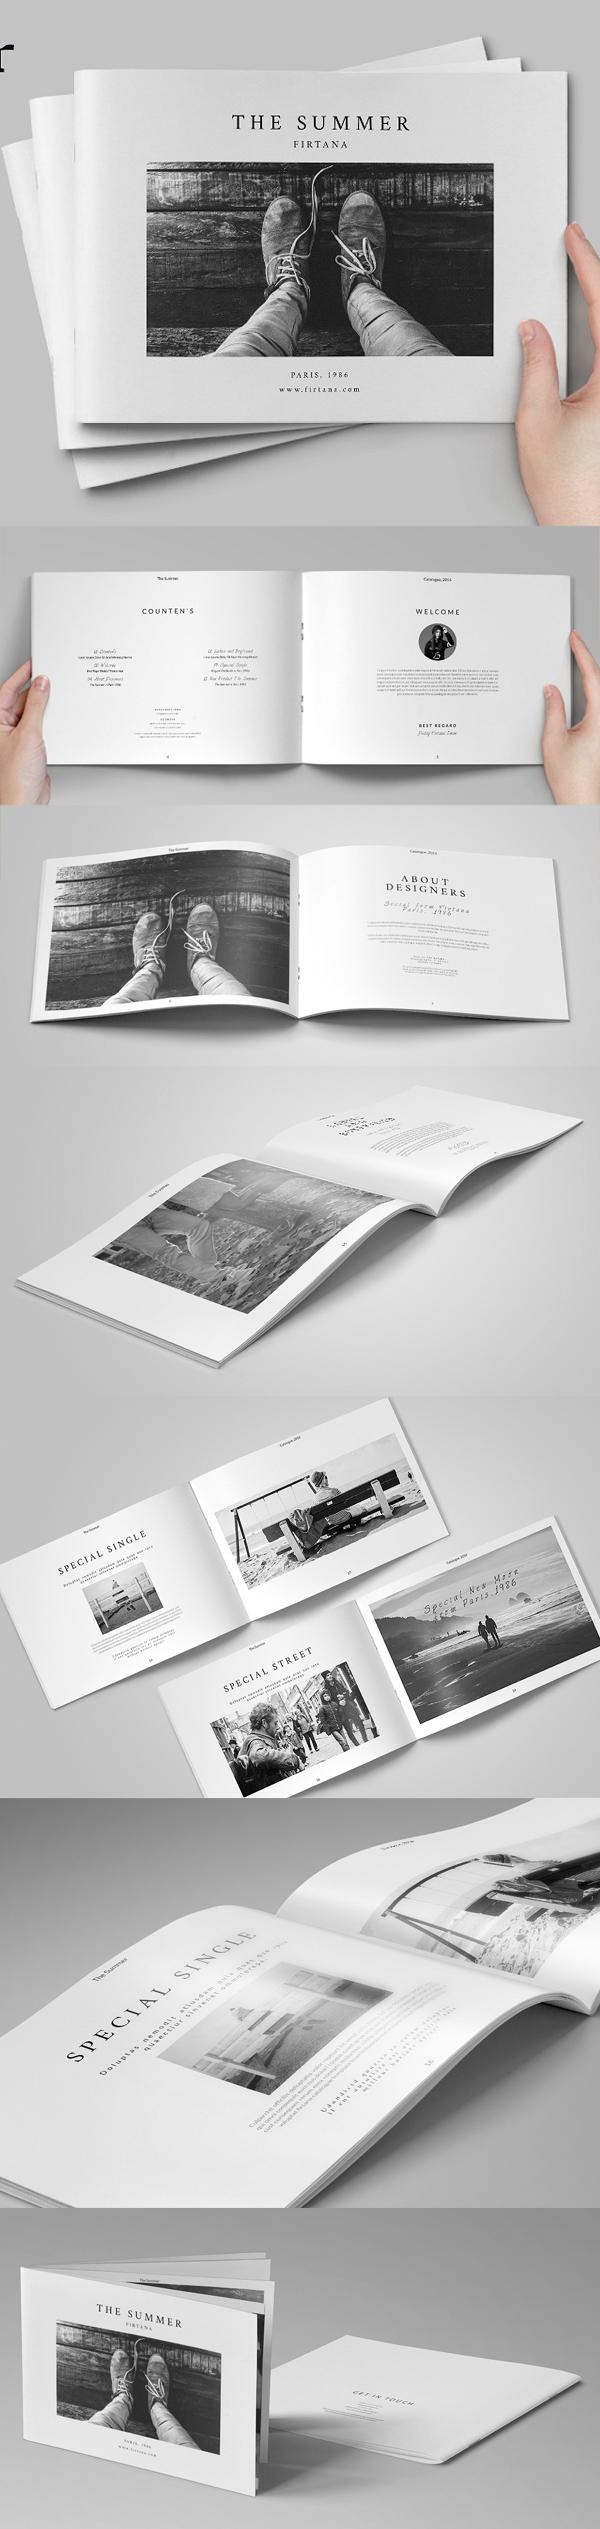 The Summer Catalogue Brochure Template